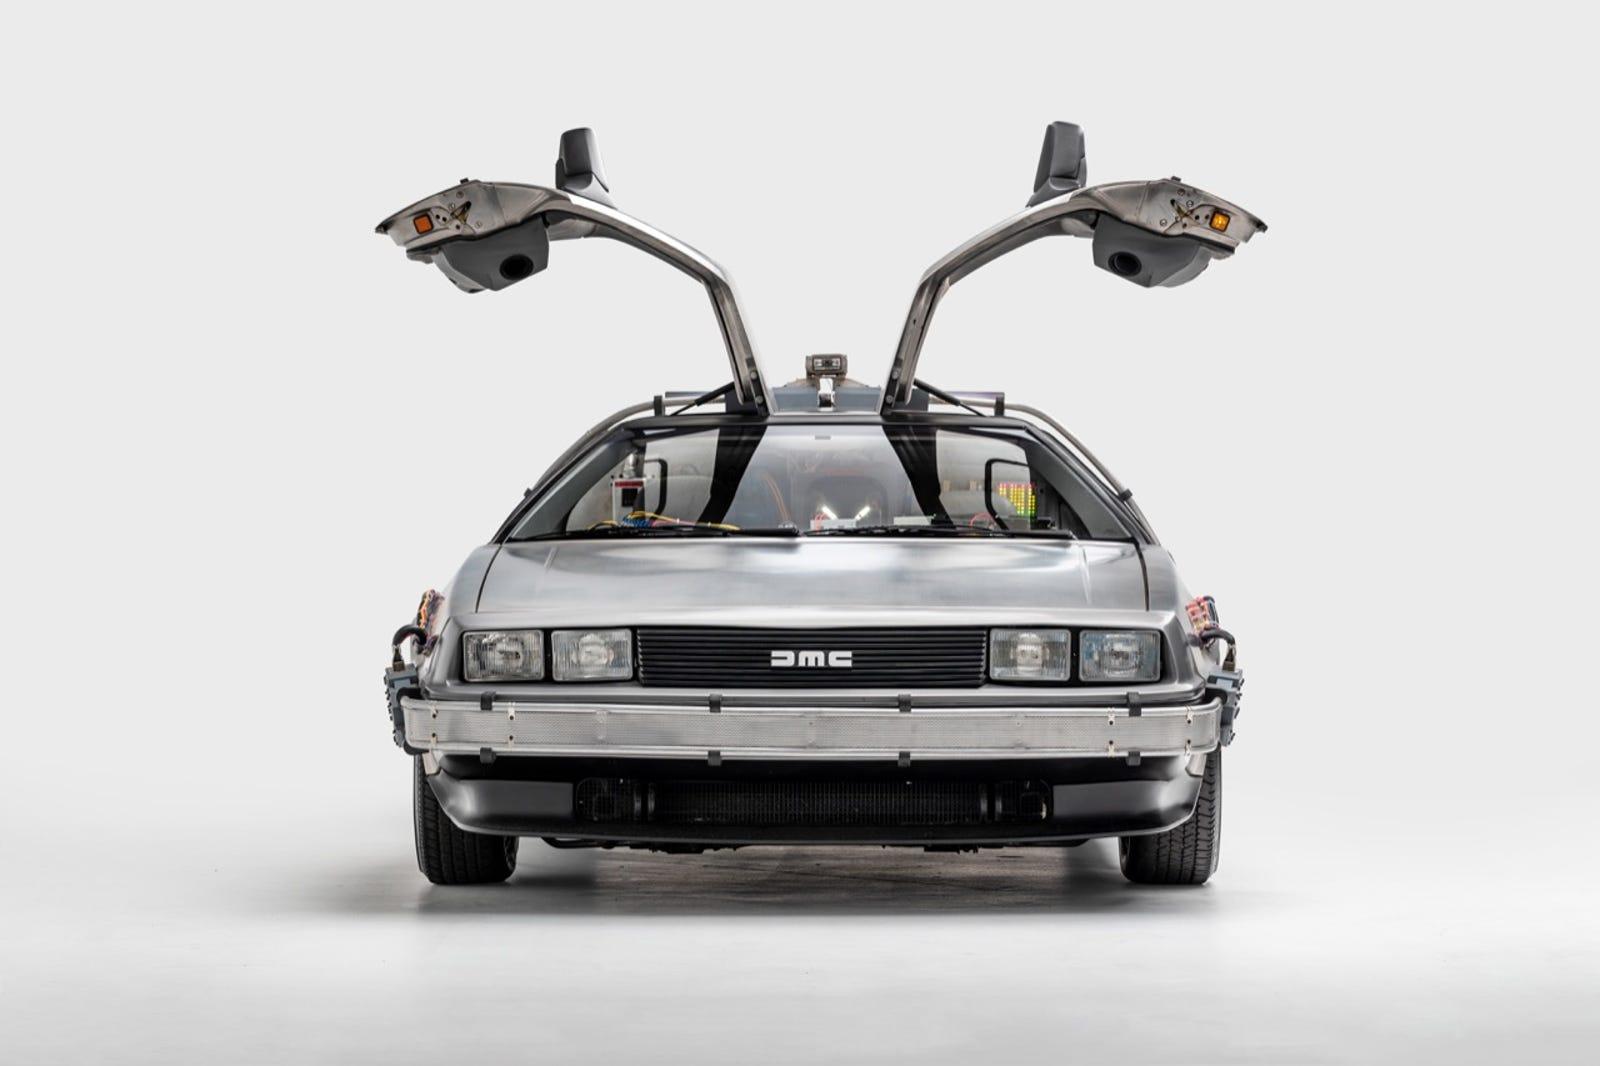 De Lorean time machine, driven in Back to the Future (1985), Back to the Future II (1989), and Back to the Future III (1990)Designers: Ron Cobb & Andrew Probert